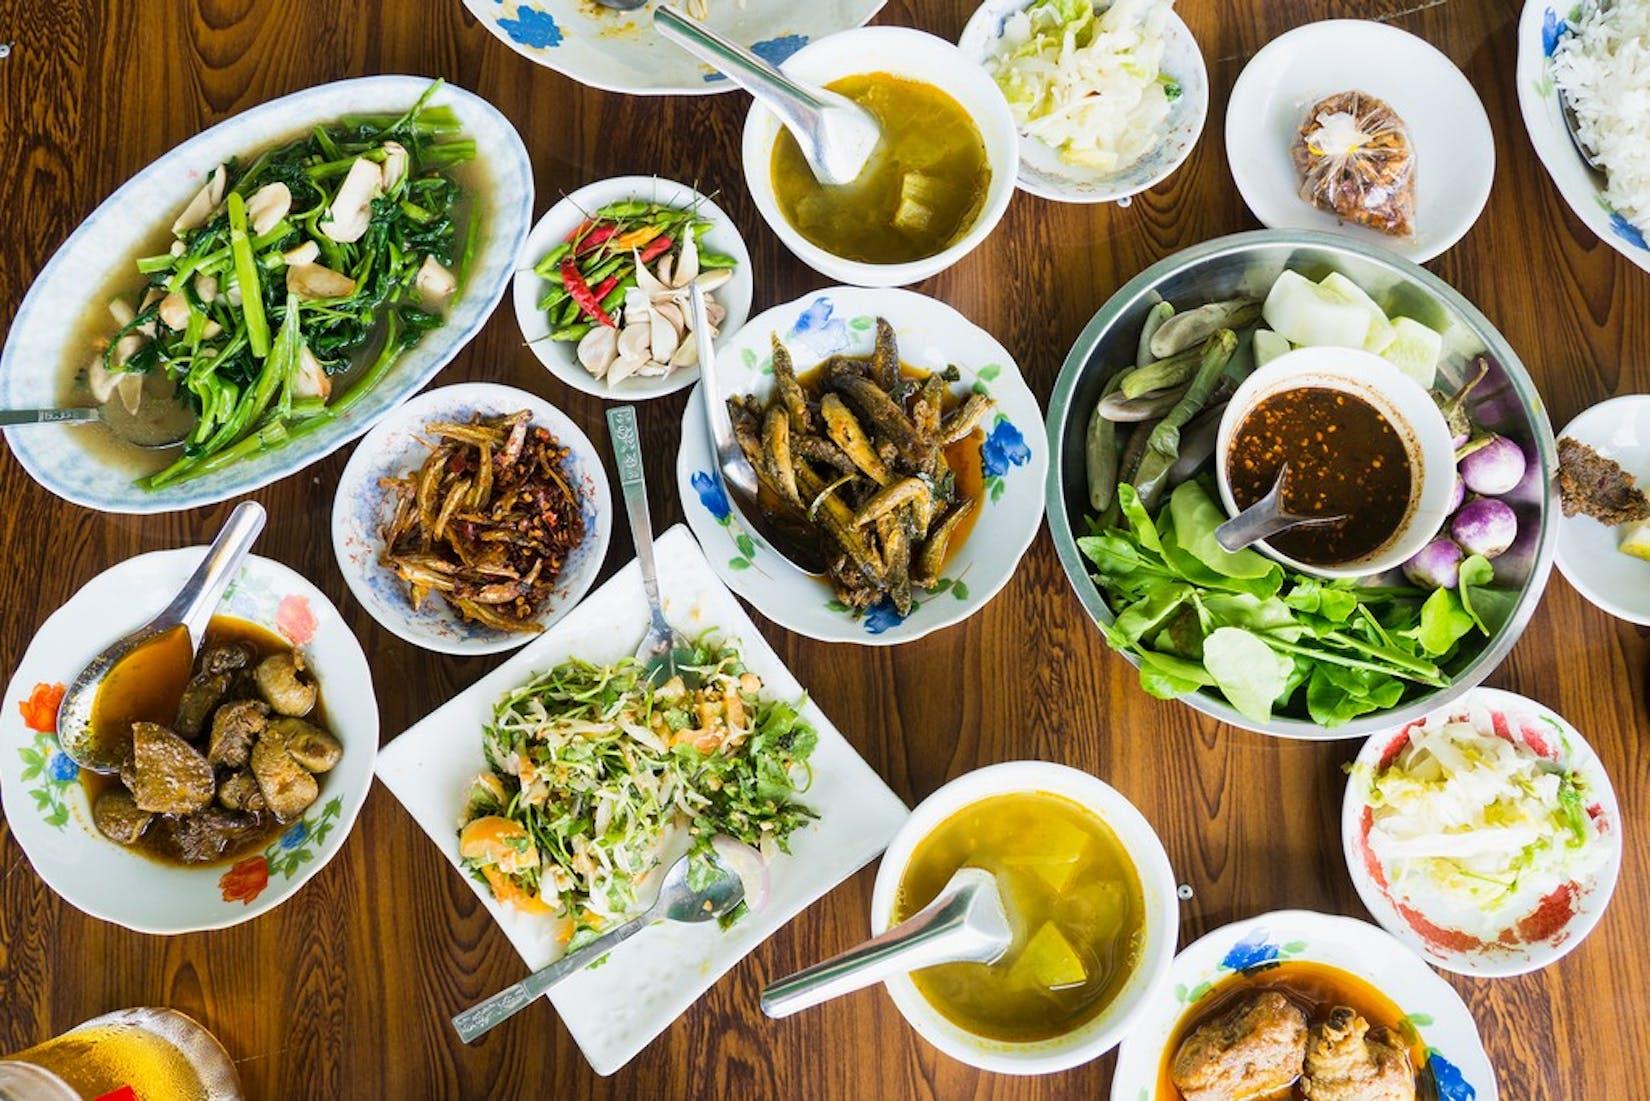 Lay Nyin Thar Meal & Cafe | yathar